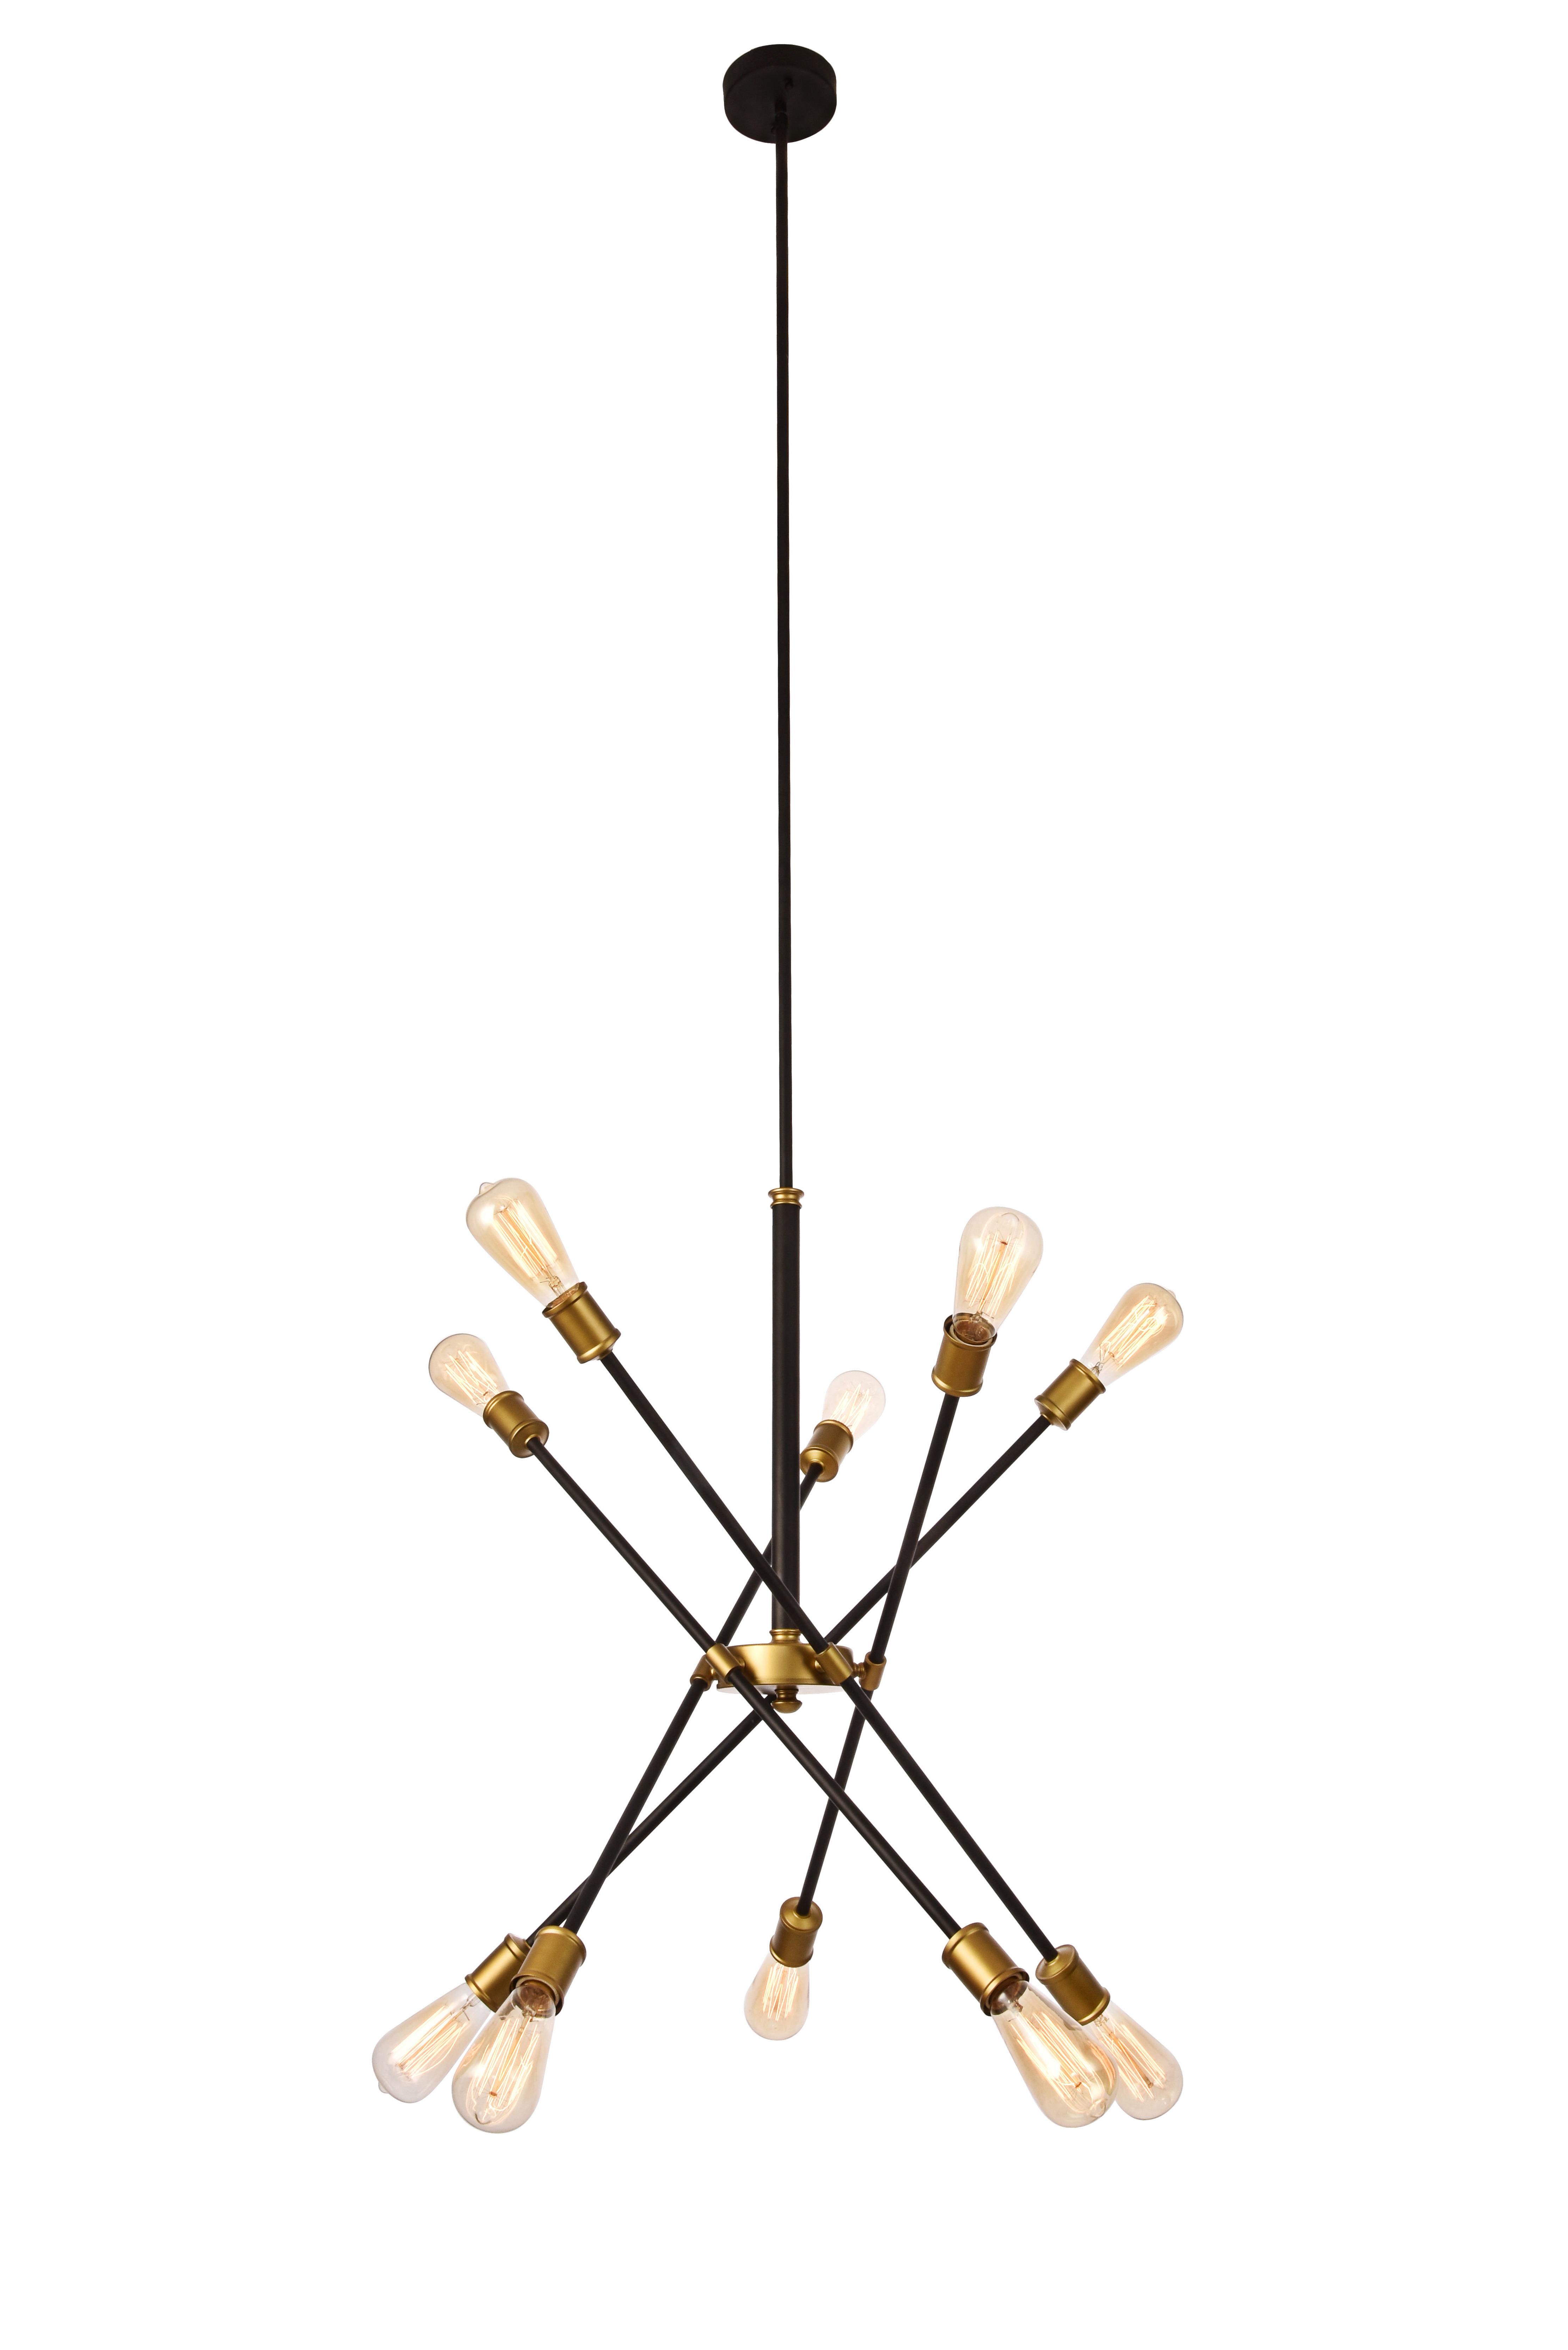 2019 Everett 10 Light Sputnik Chandeliers Regarding Everett 10 Light Sputnik Chandelier (Gallery 2 of 20)